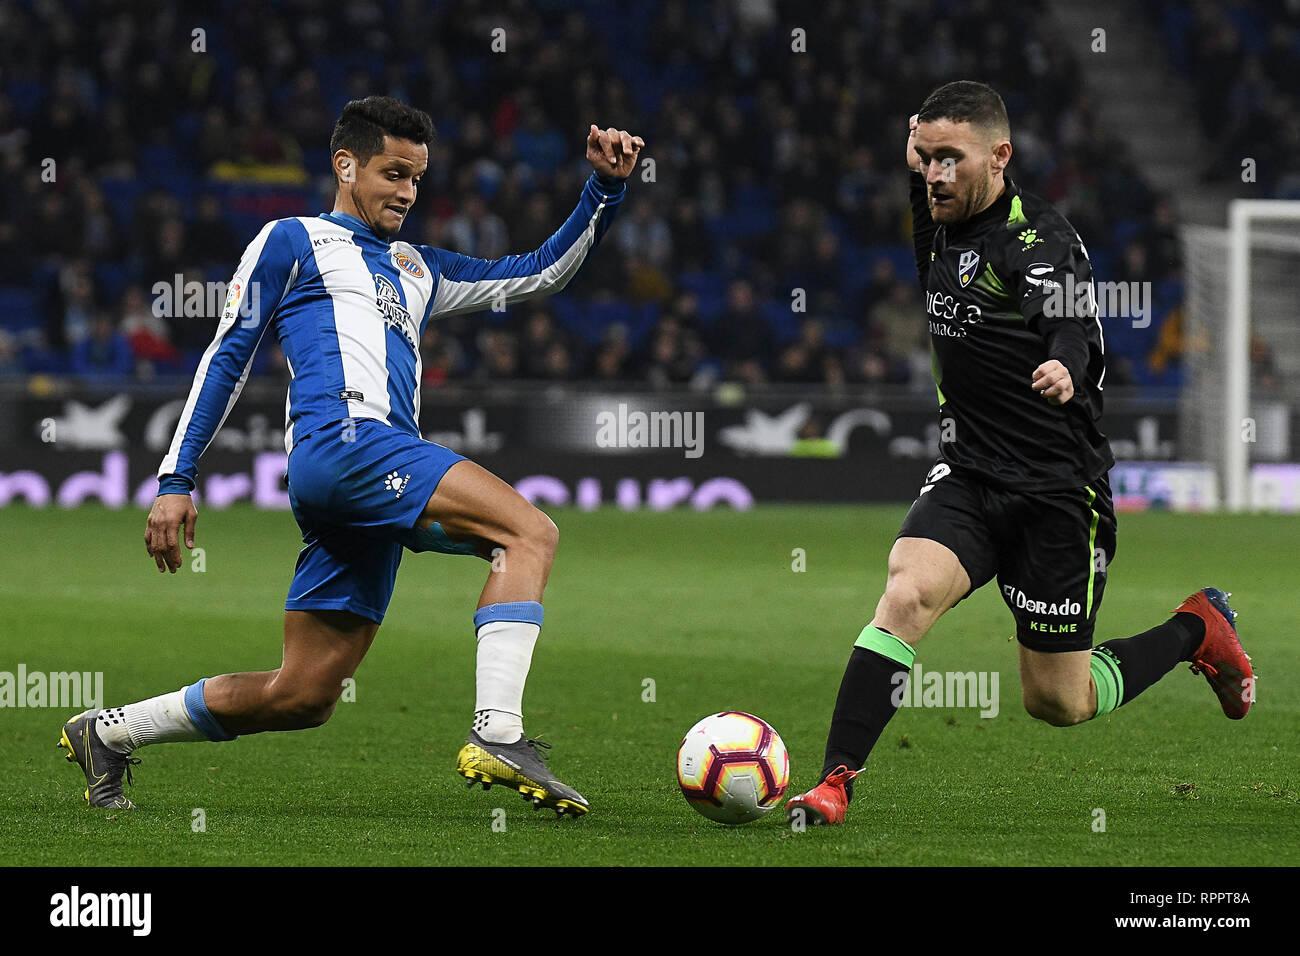 Roberto Rosales of RCD Espanyol and Javi Galan of SD Huesca during the match between RCD Espanyol vs SD Huesca of La Liga, date 25, 2018-2019 season. RCDE Stadium. Barcelona, Spain - 22 FEB 2019. - Stock Image